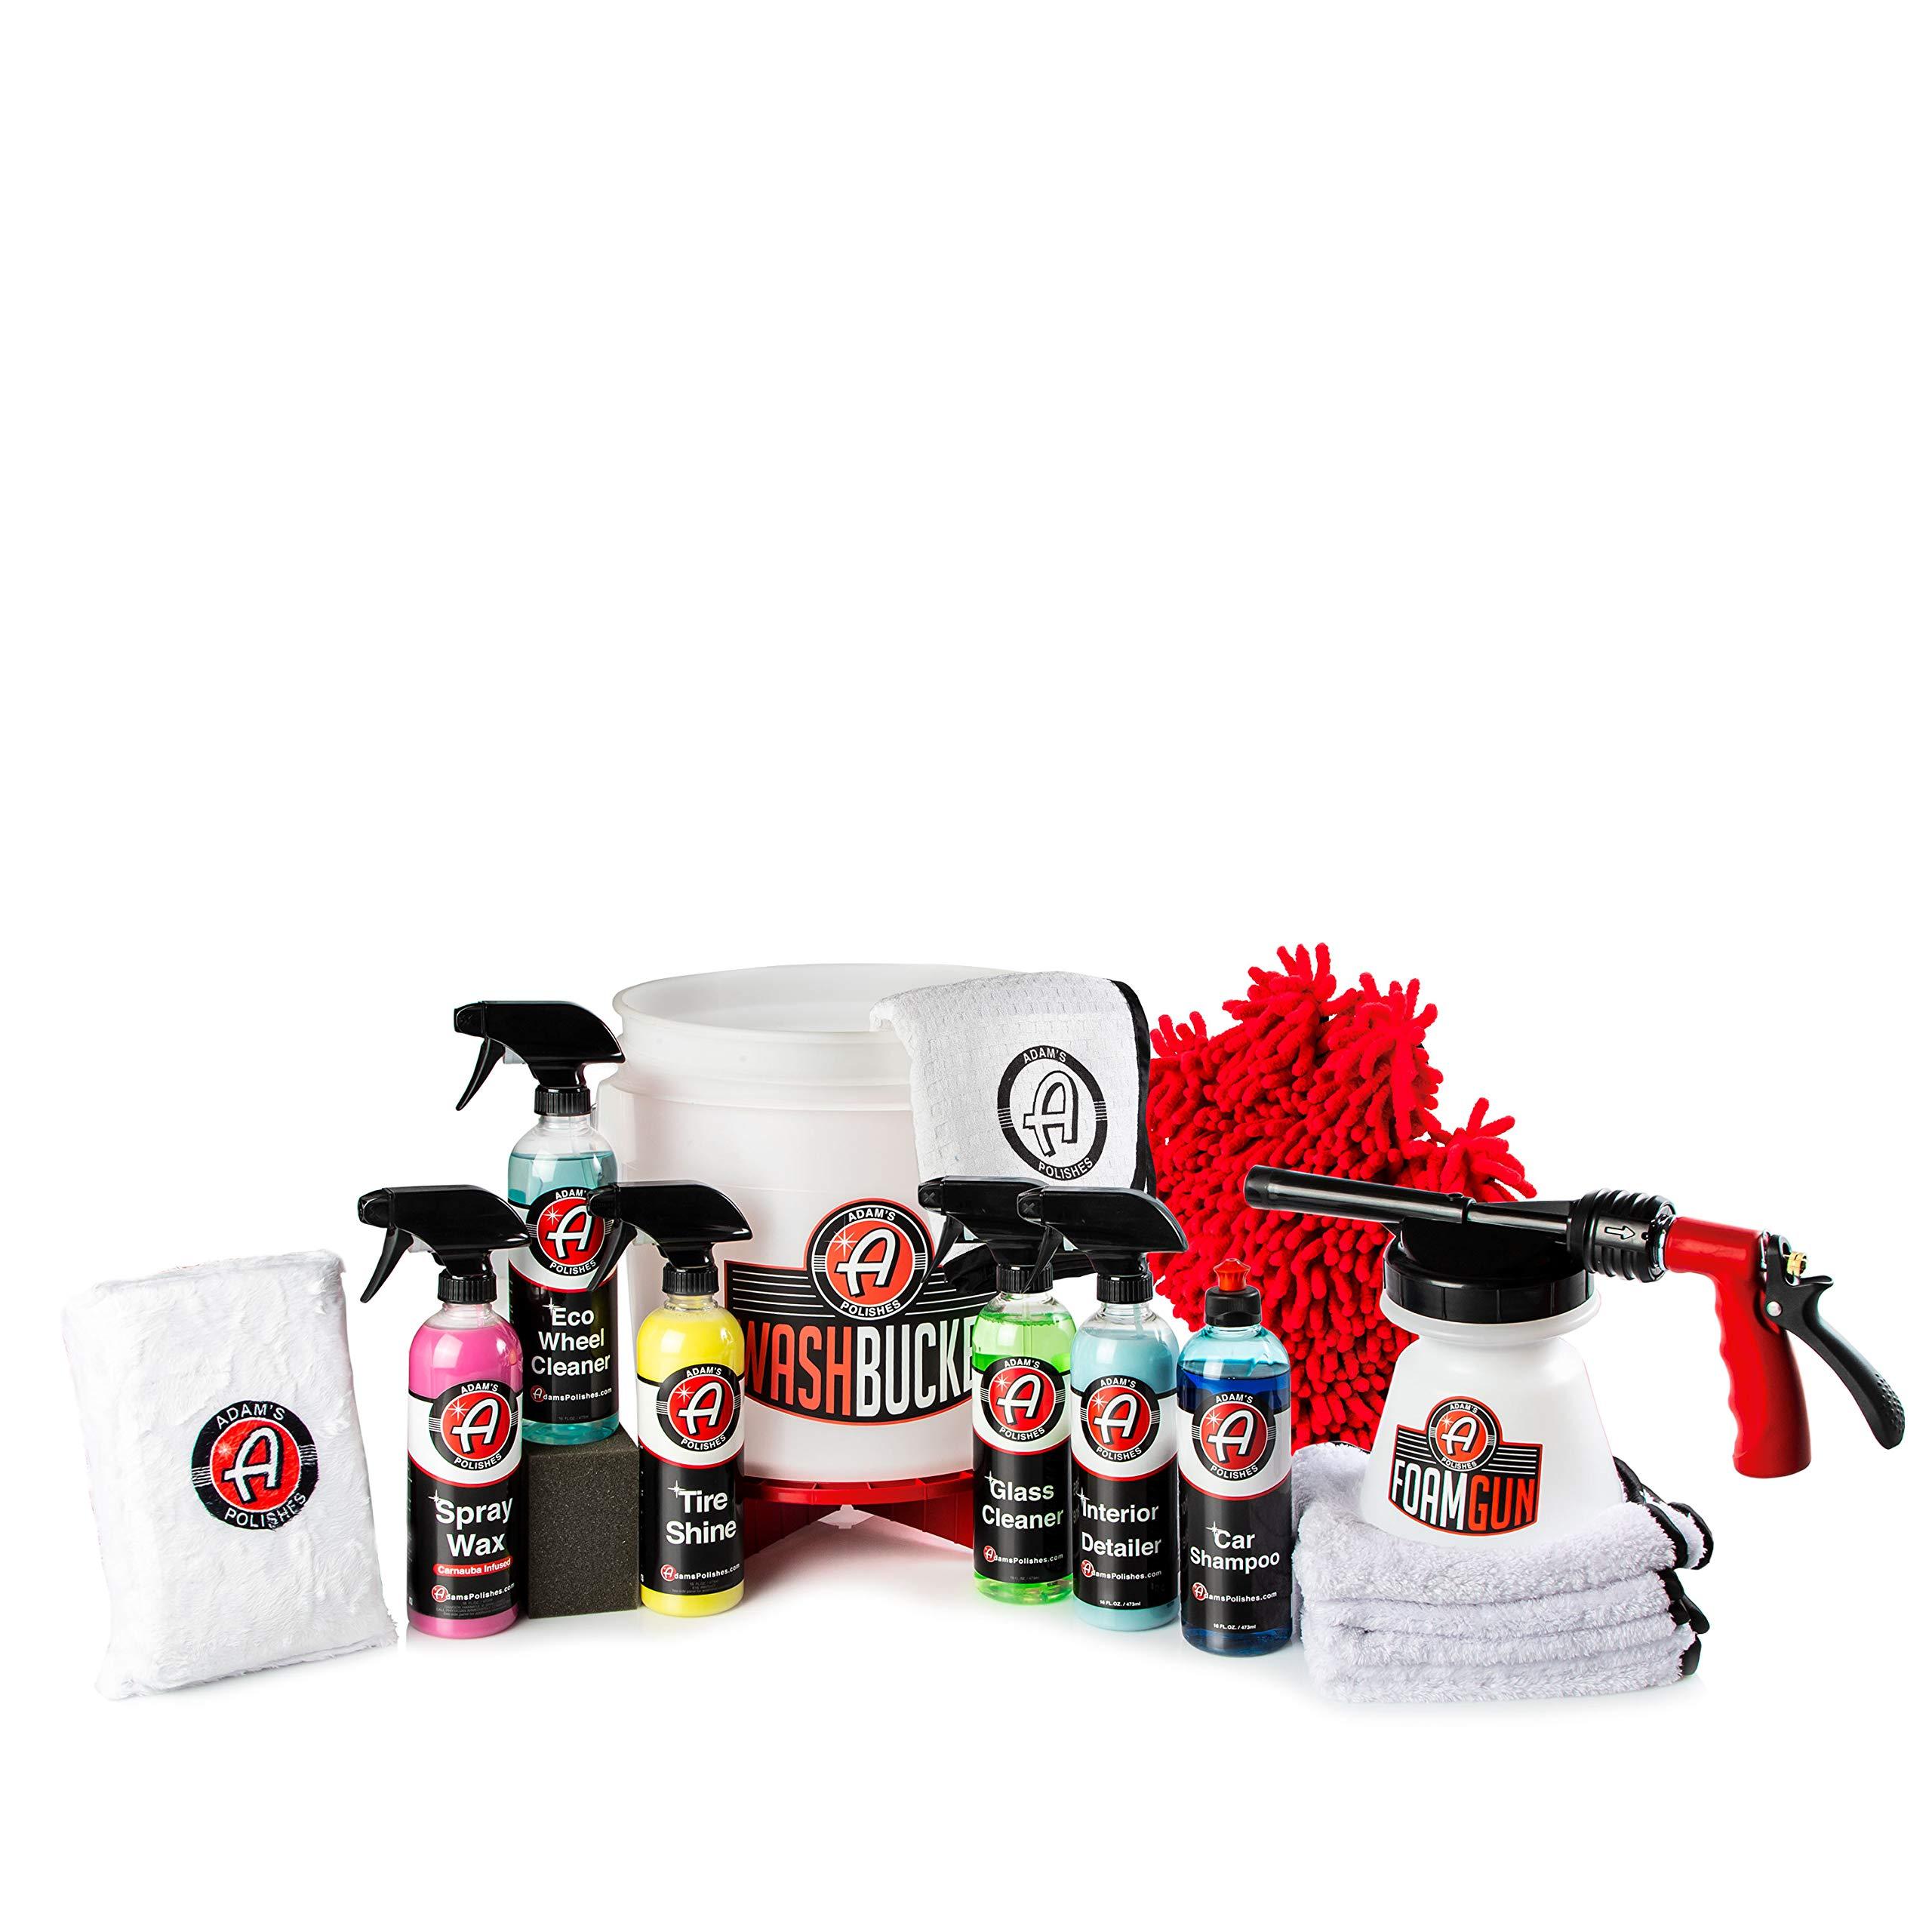 Adam's 17 Piece Arsenal Builder Wash Kit w/Foam Gun, Car Shampoo Soap, Microfiber Towels, Tire Applicator Sponge, Tire Shine, Glass Cleaner, Bucket - Cleaning Supplies for Car, Boat, RV & Motorcycle